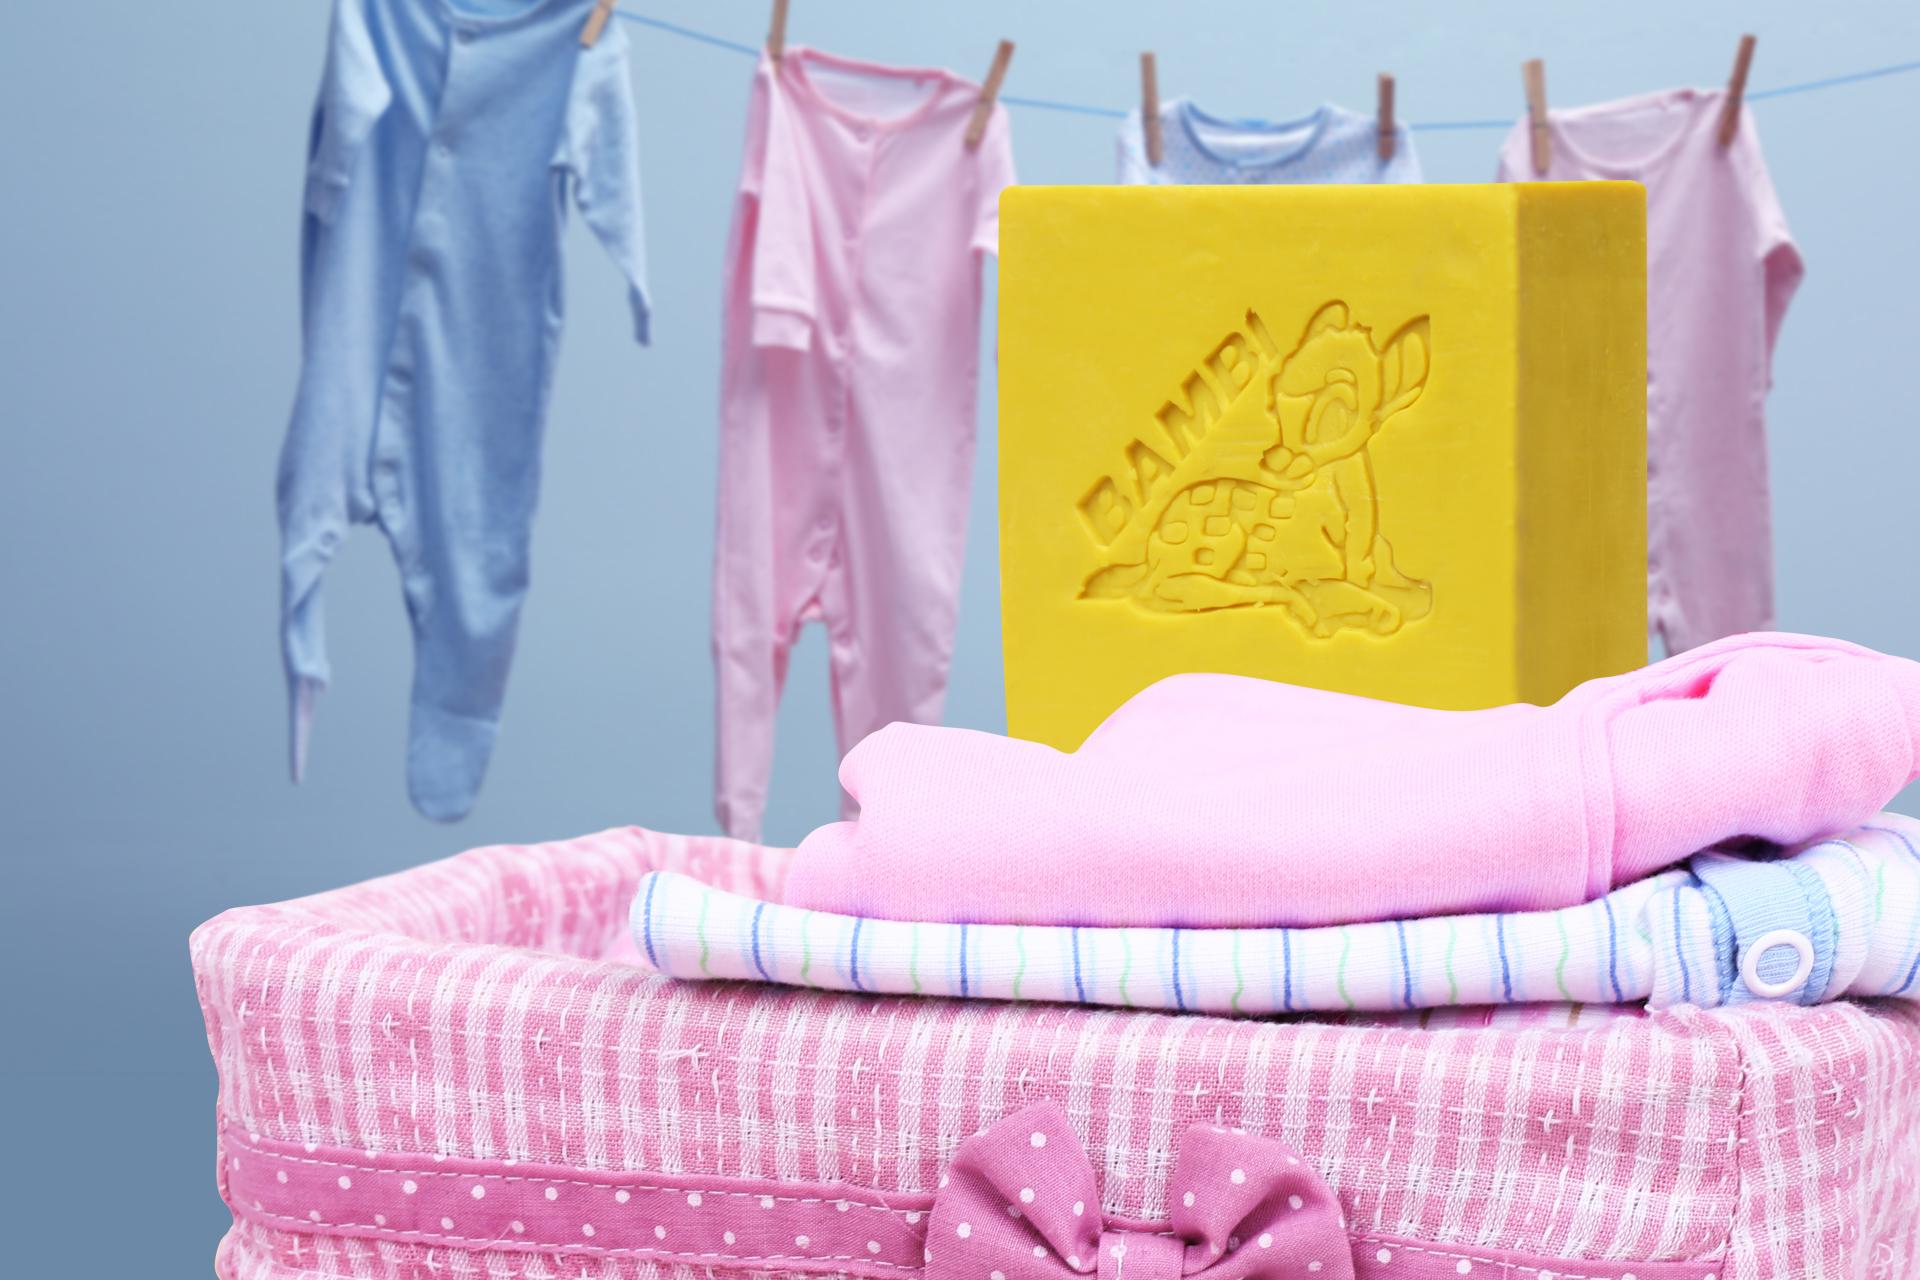 https://www.orbitsarl.com/wp-content/uploads/2017/11/Product-Cleaning_Bambi-LaundrySoap_1920x1280-FIN.jpg